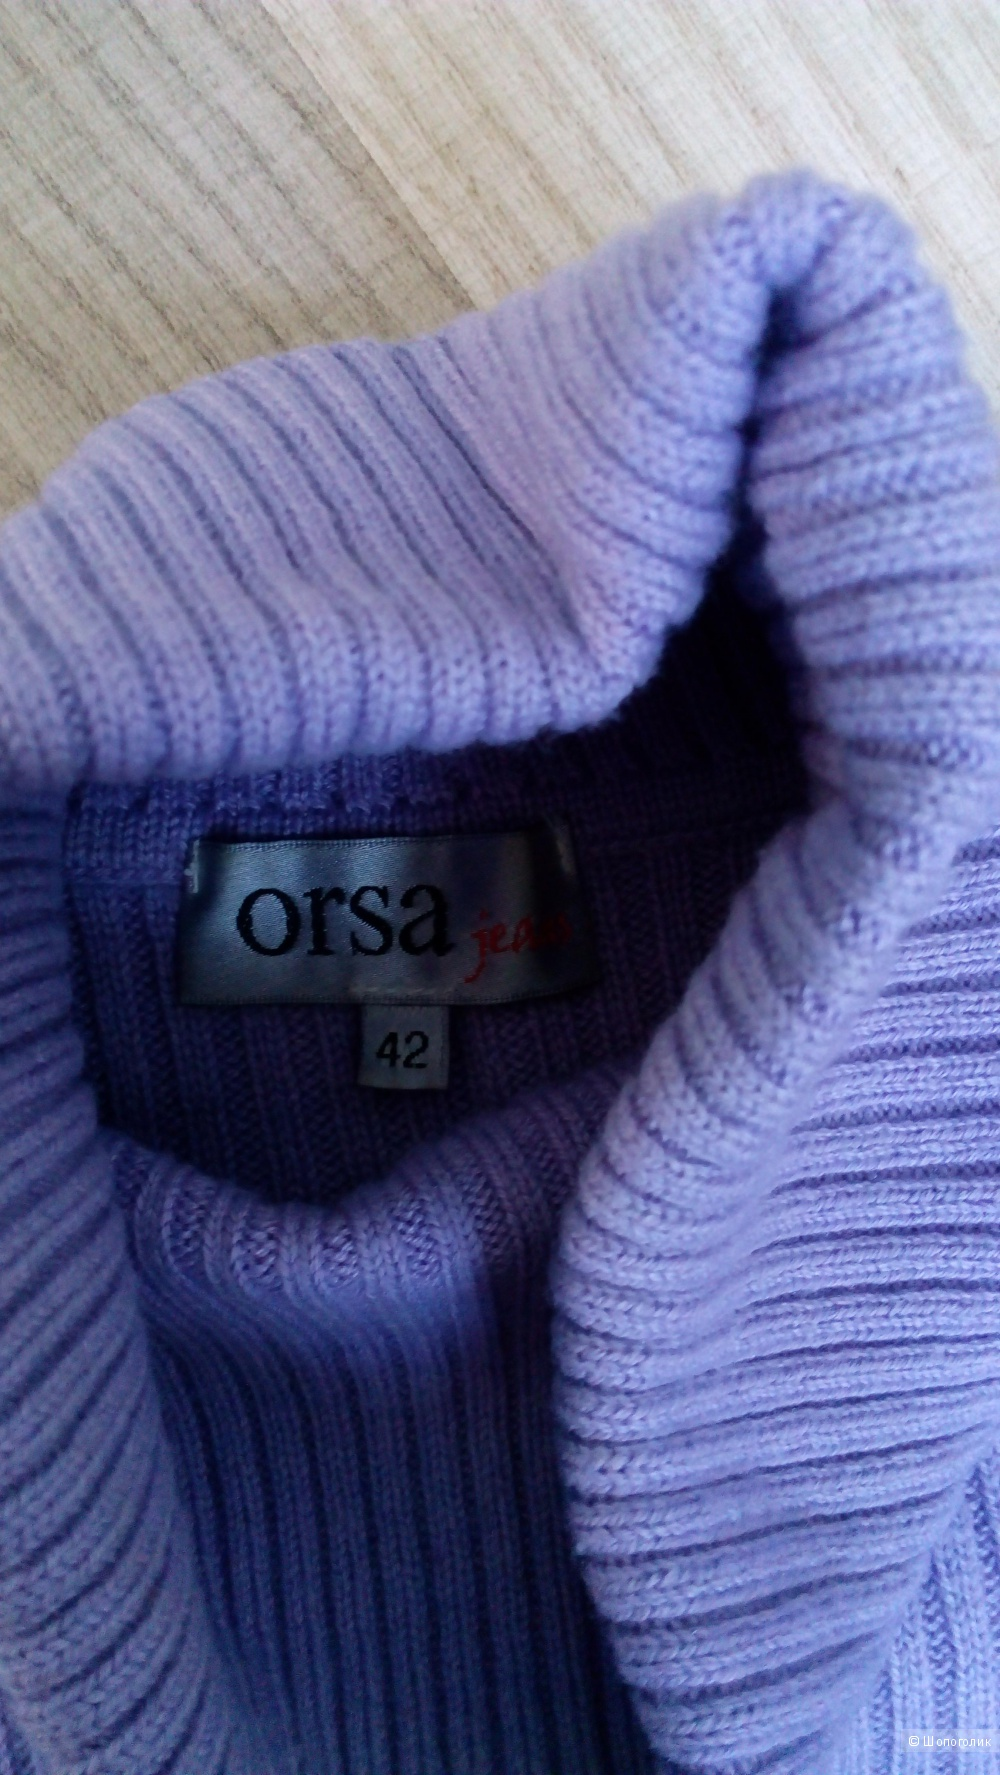 Платье Orsa размер 42-44